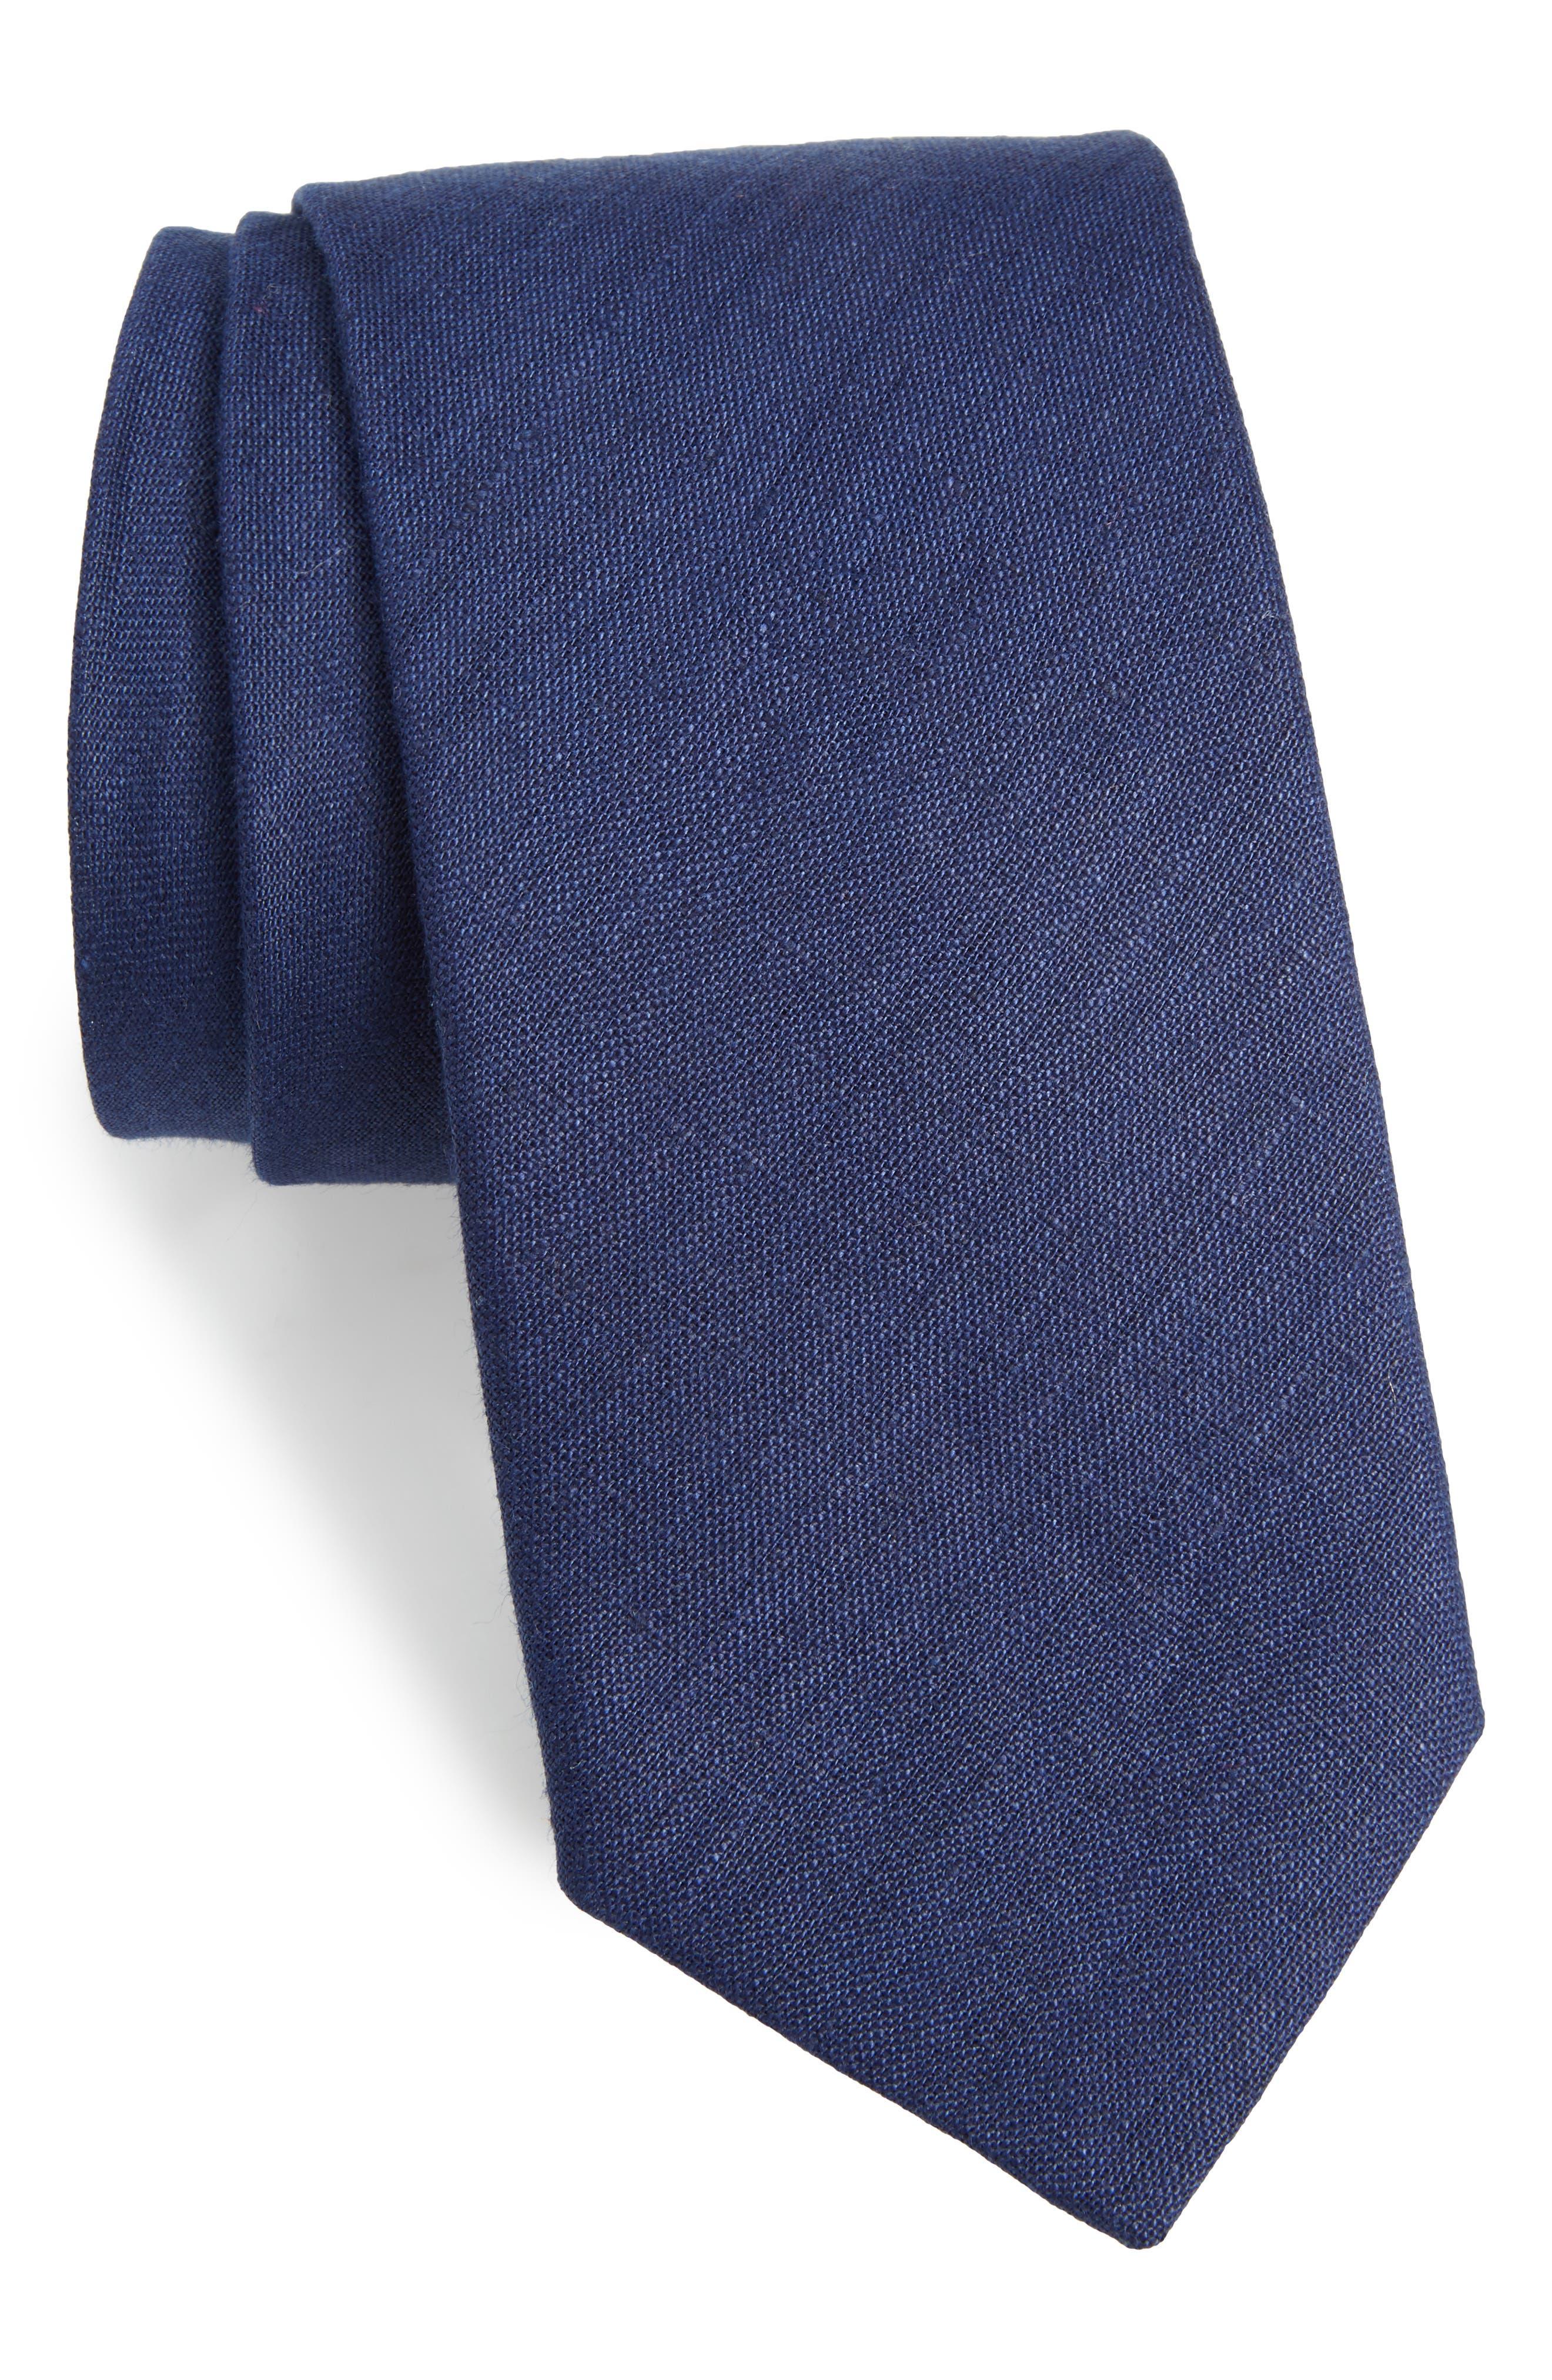 Solid Linen Tie,                         Main,                         color, Solid Linen